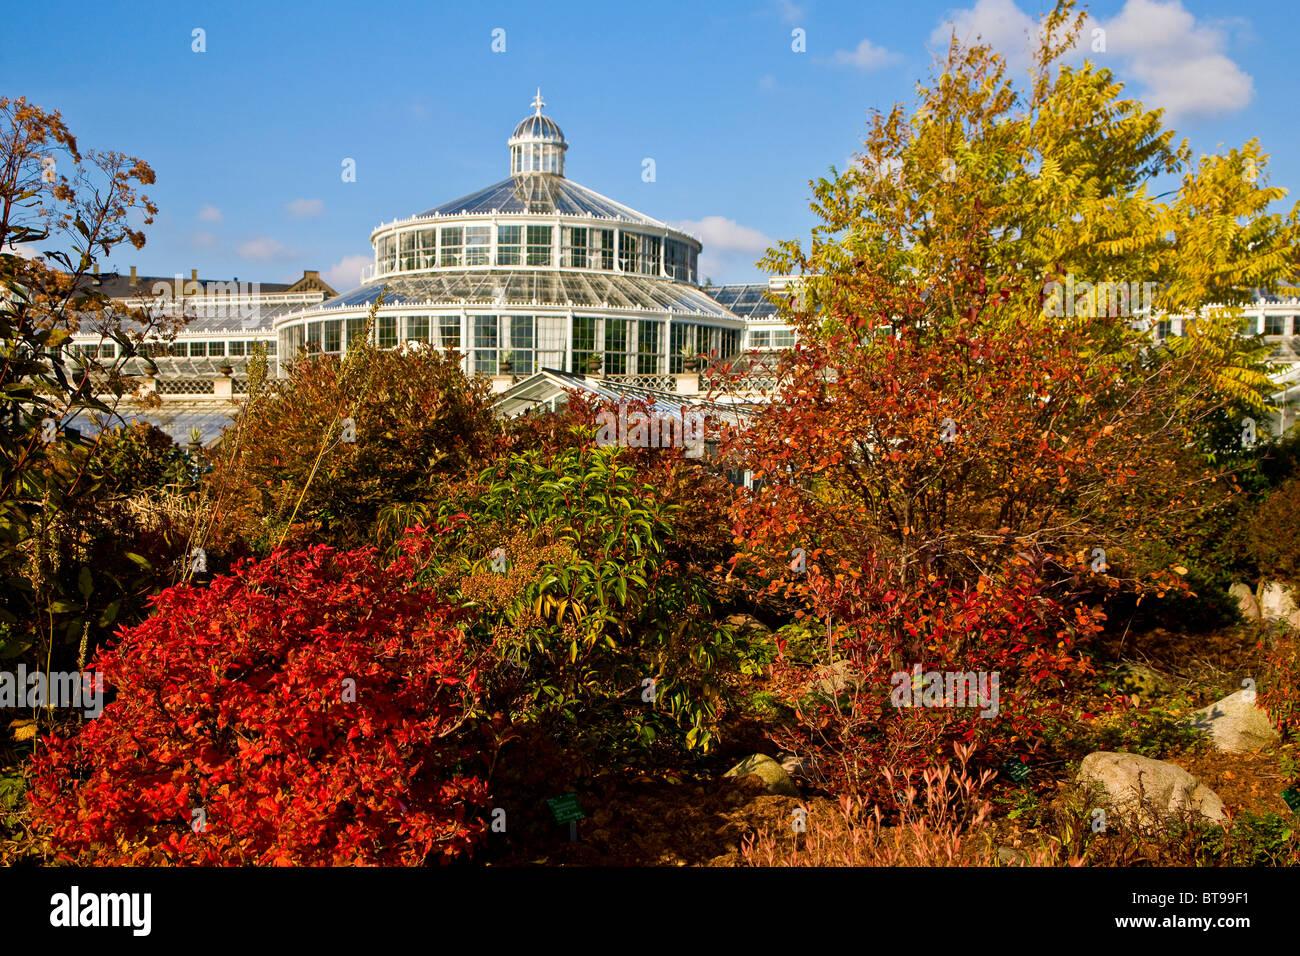 Botanical Garden Autumn Trees Stock Photos & Botanical Garden Autumn ...